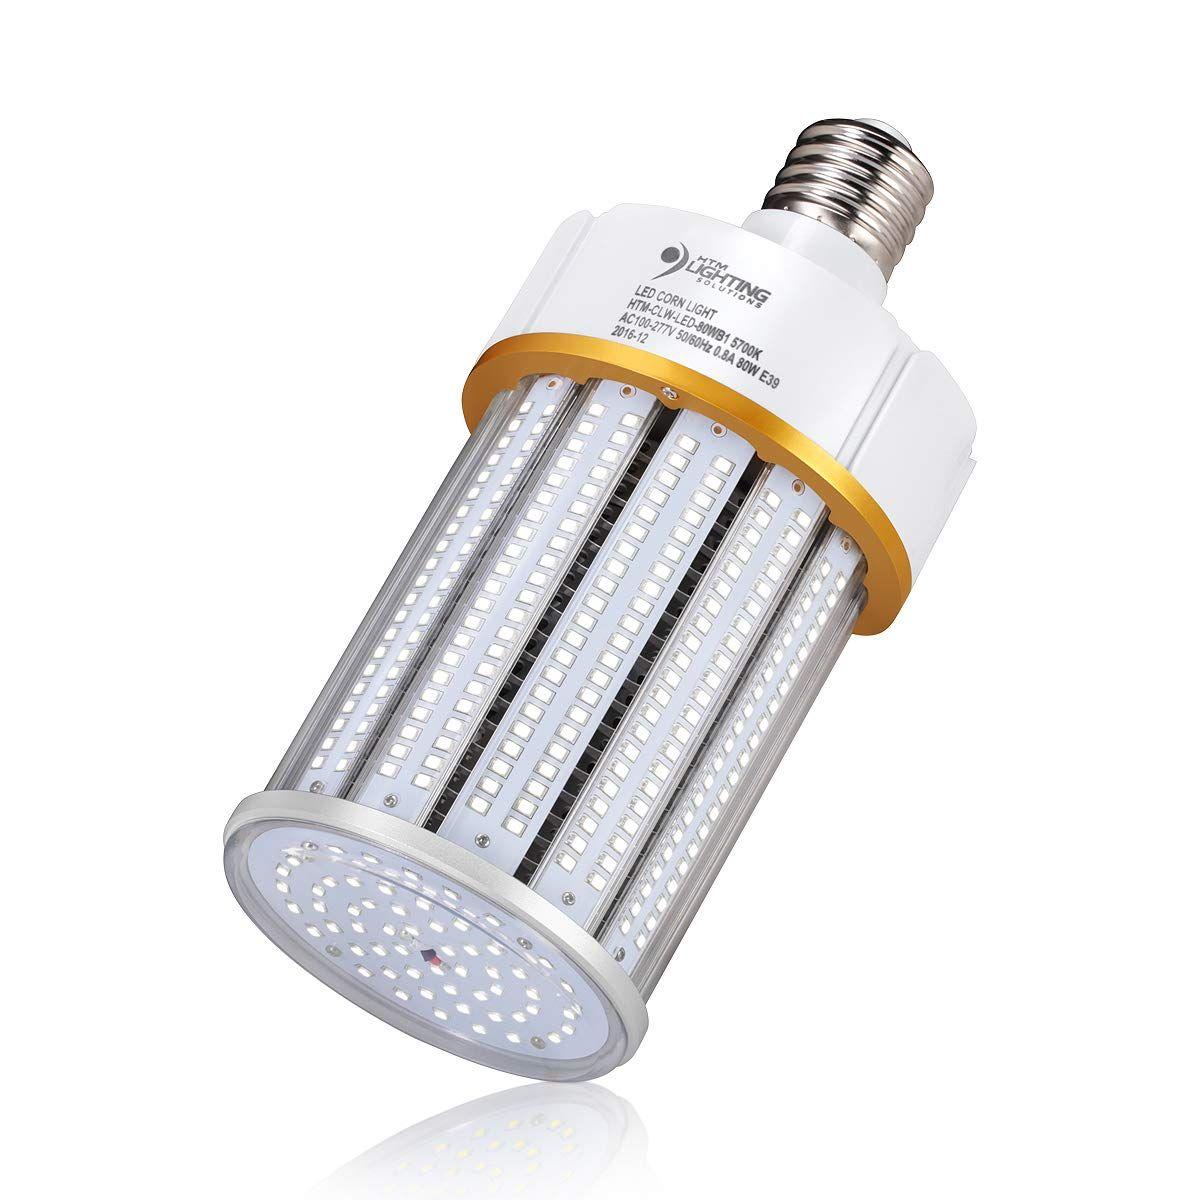 80w Led Corn Light Bulb 250 400 Watts Metal Halide Hps Replacement Large E39 Mogul Screw Base Ul Listed And Dlc Quali Led Bulb Light Bulb High Bay Lighting